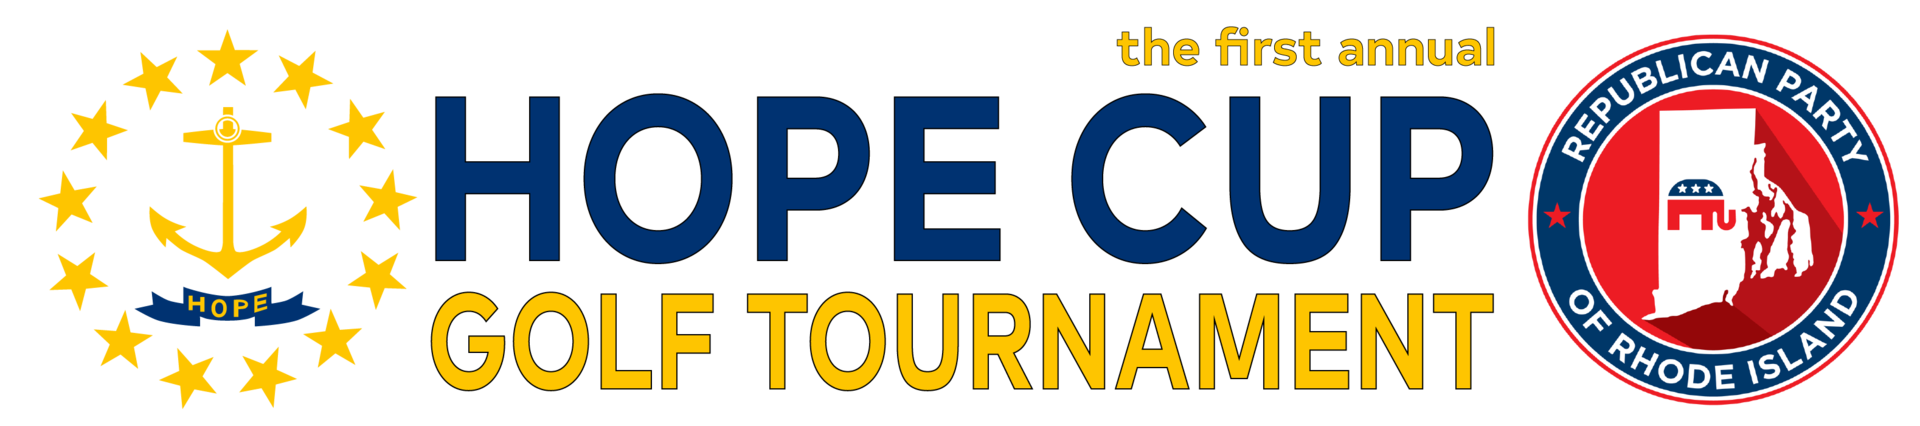 Hope cup logo 01